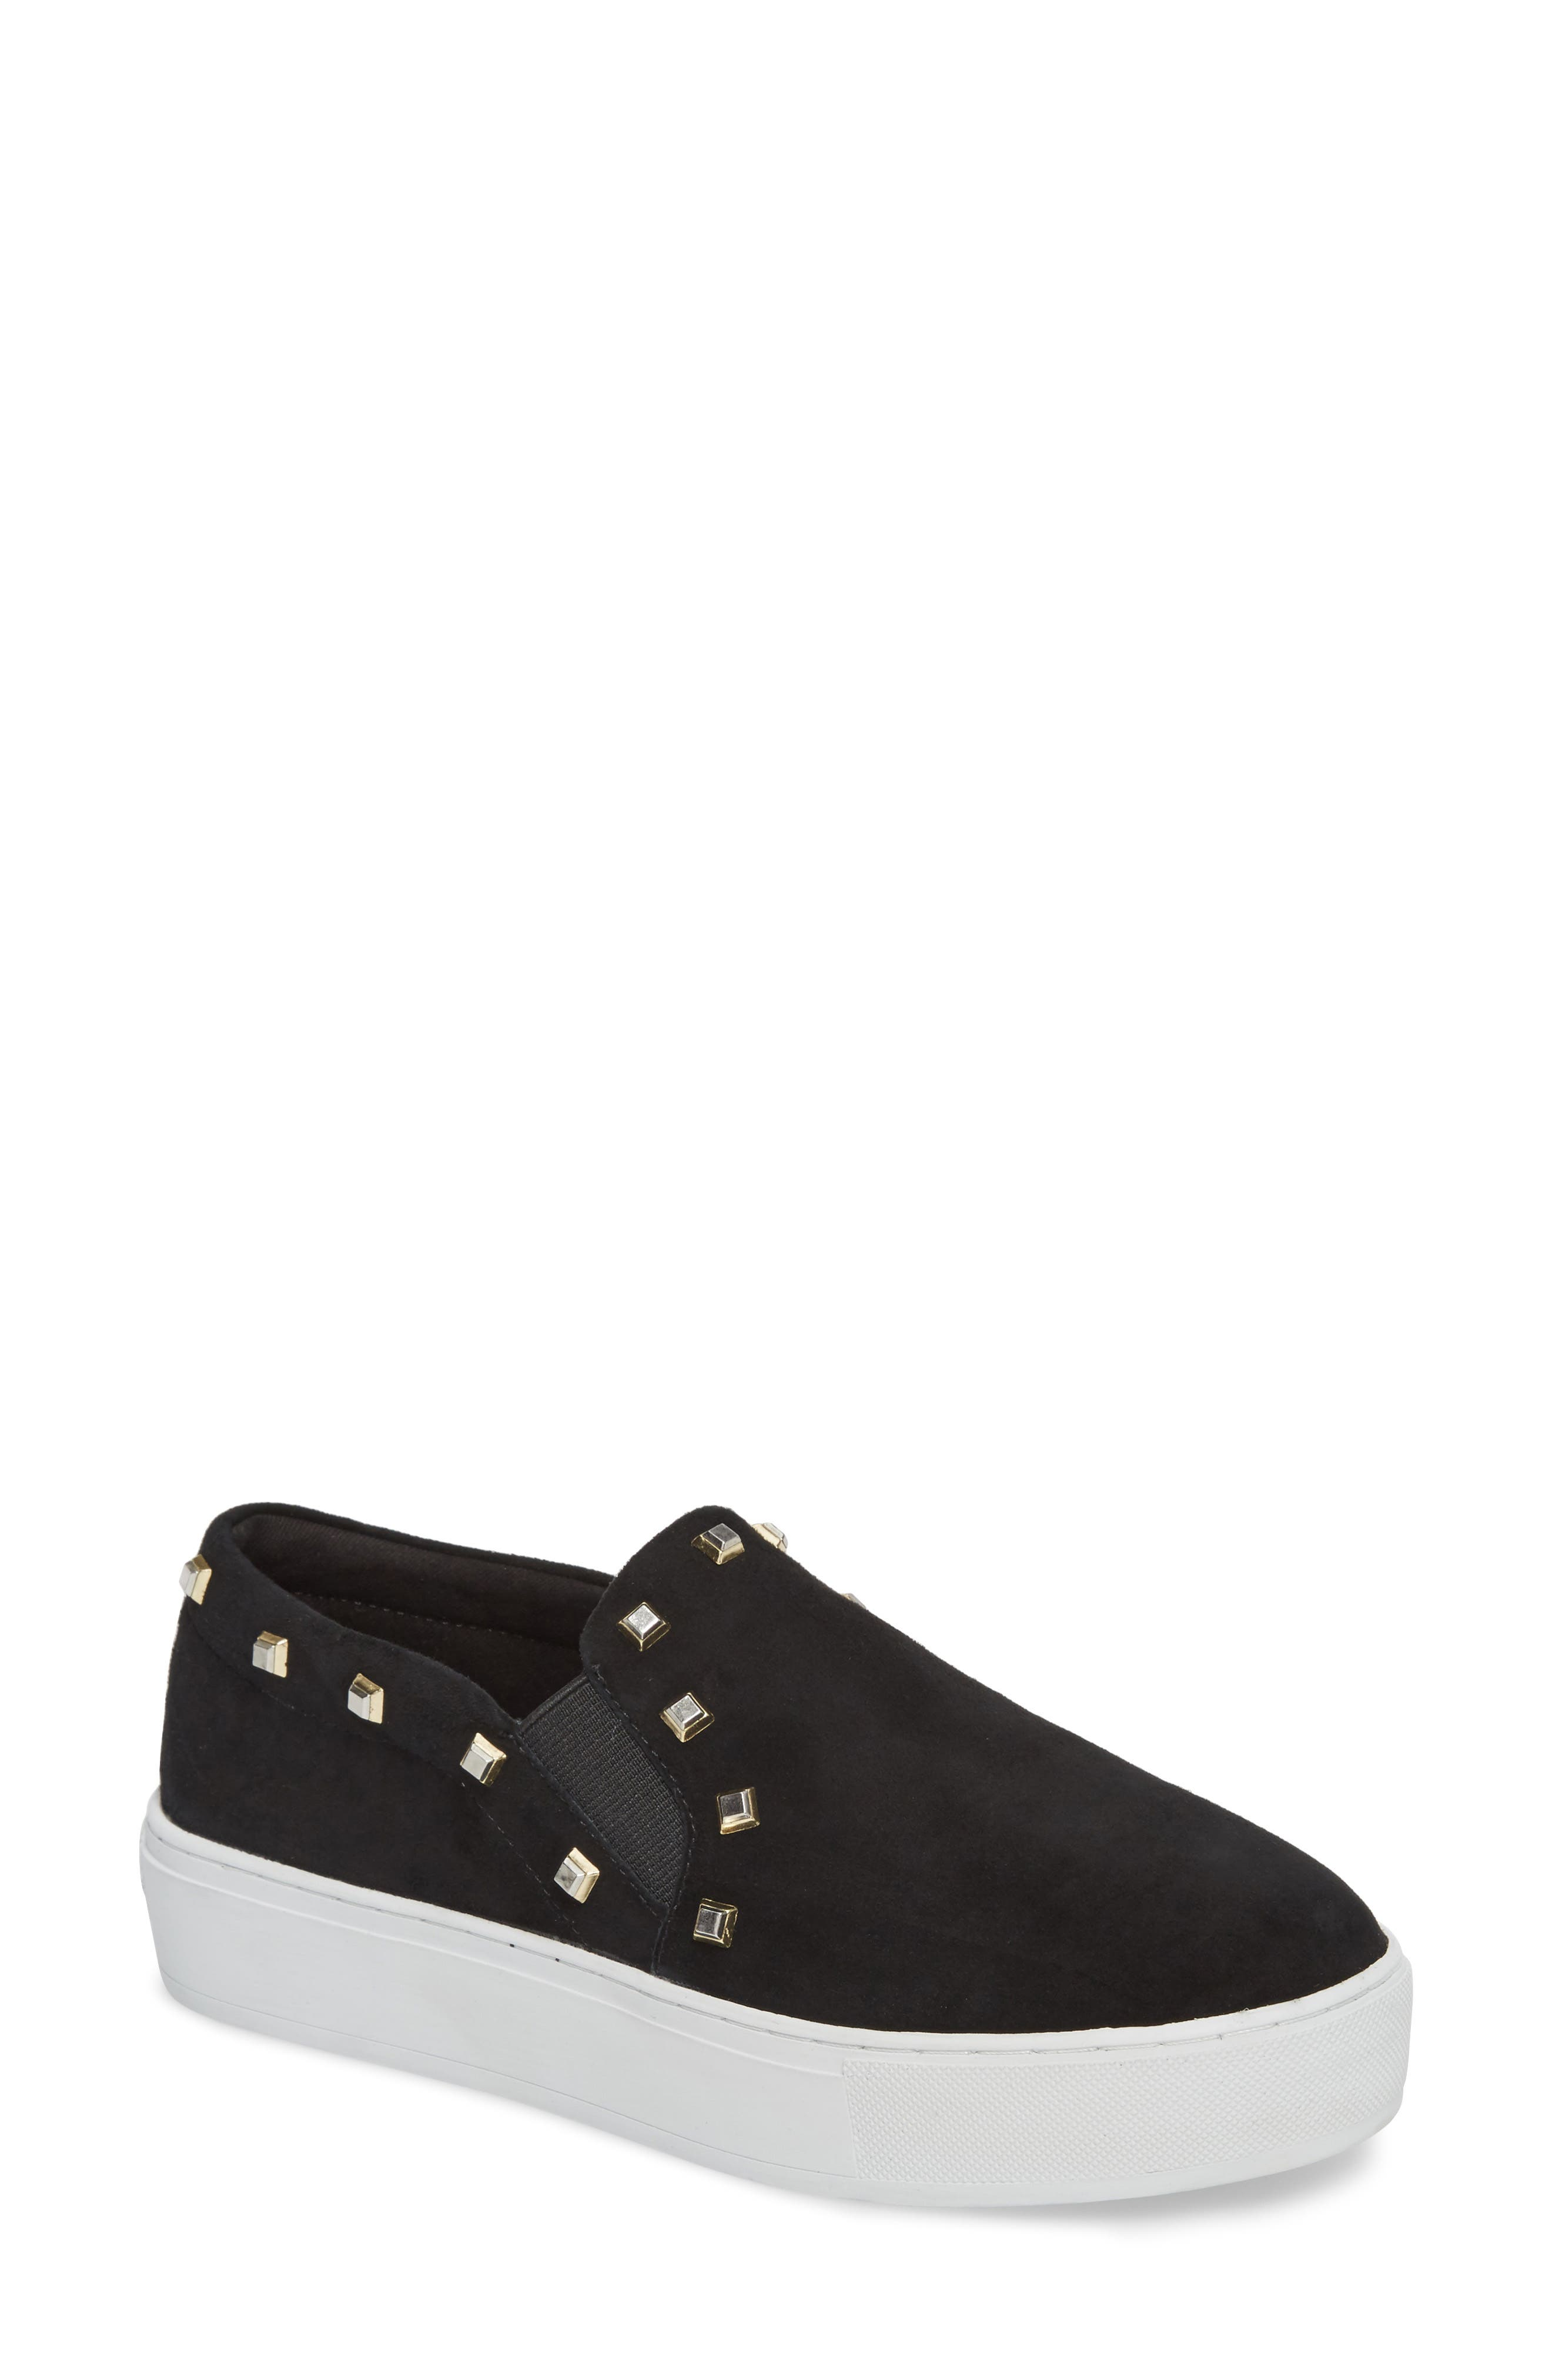 Nora Stud Platform Sneaker,                             Main thumbnail 1, color,                             Black Suede